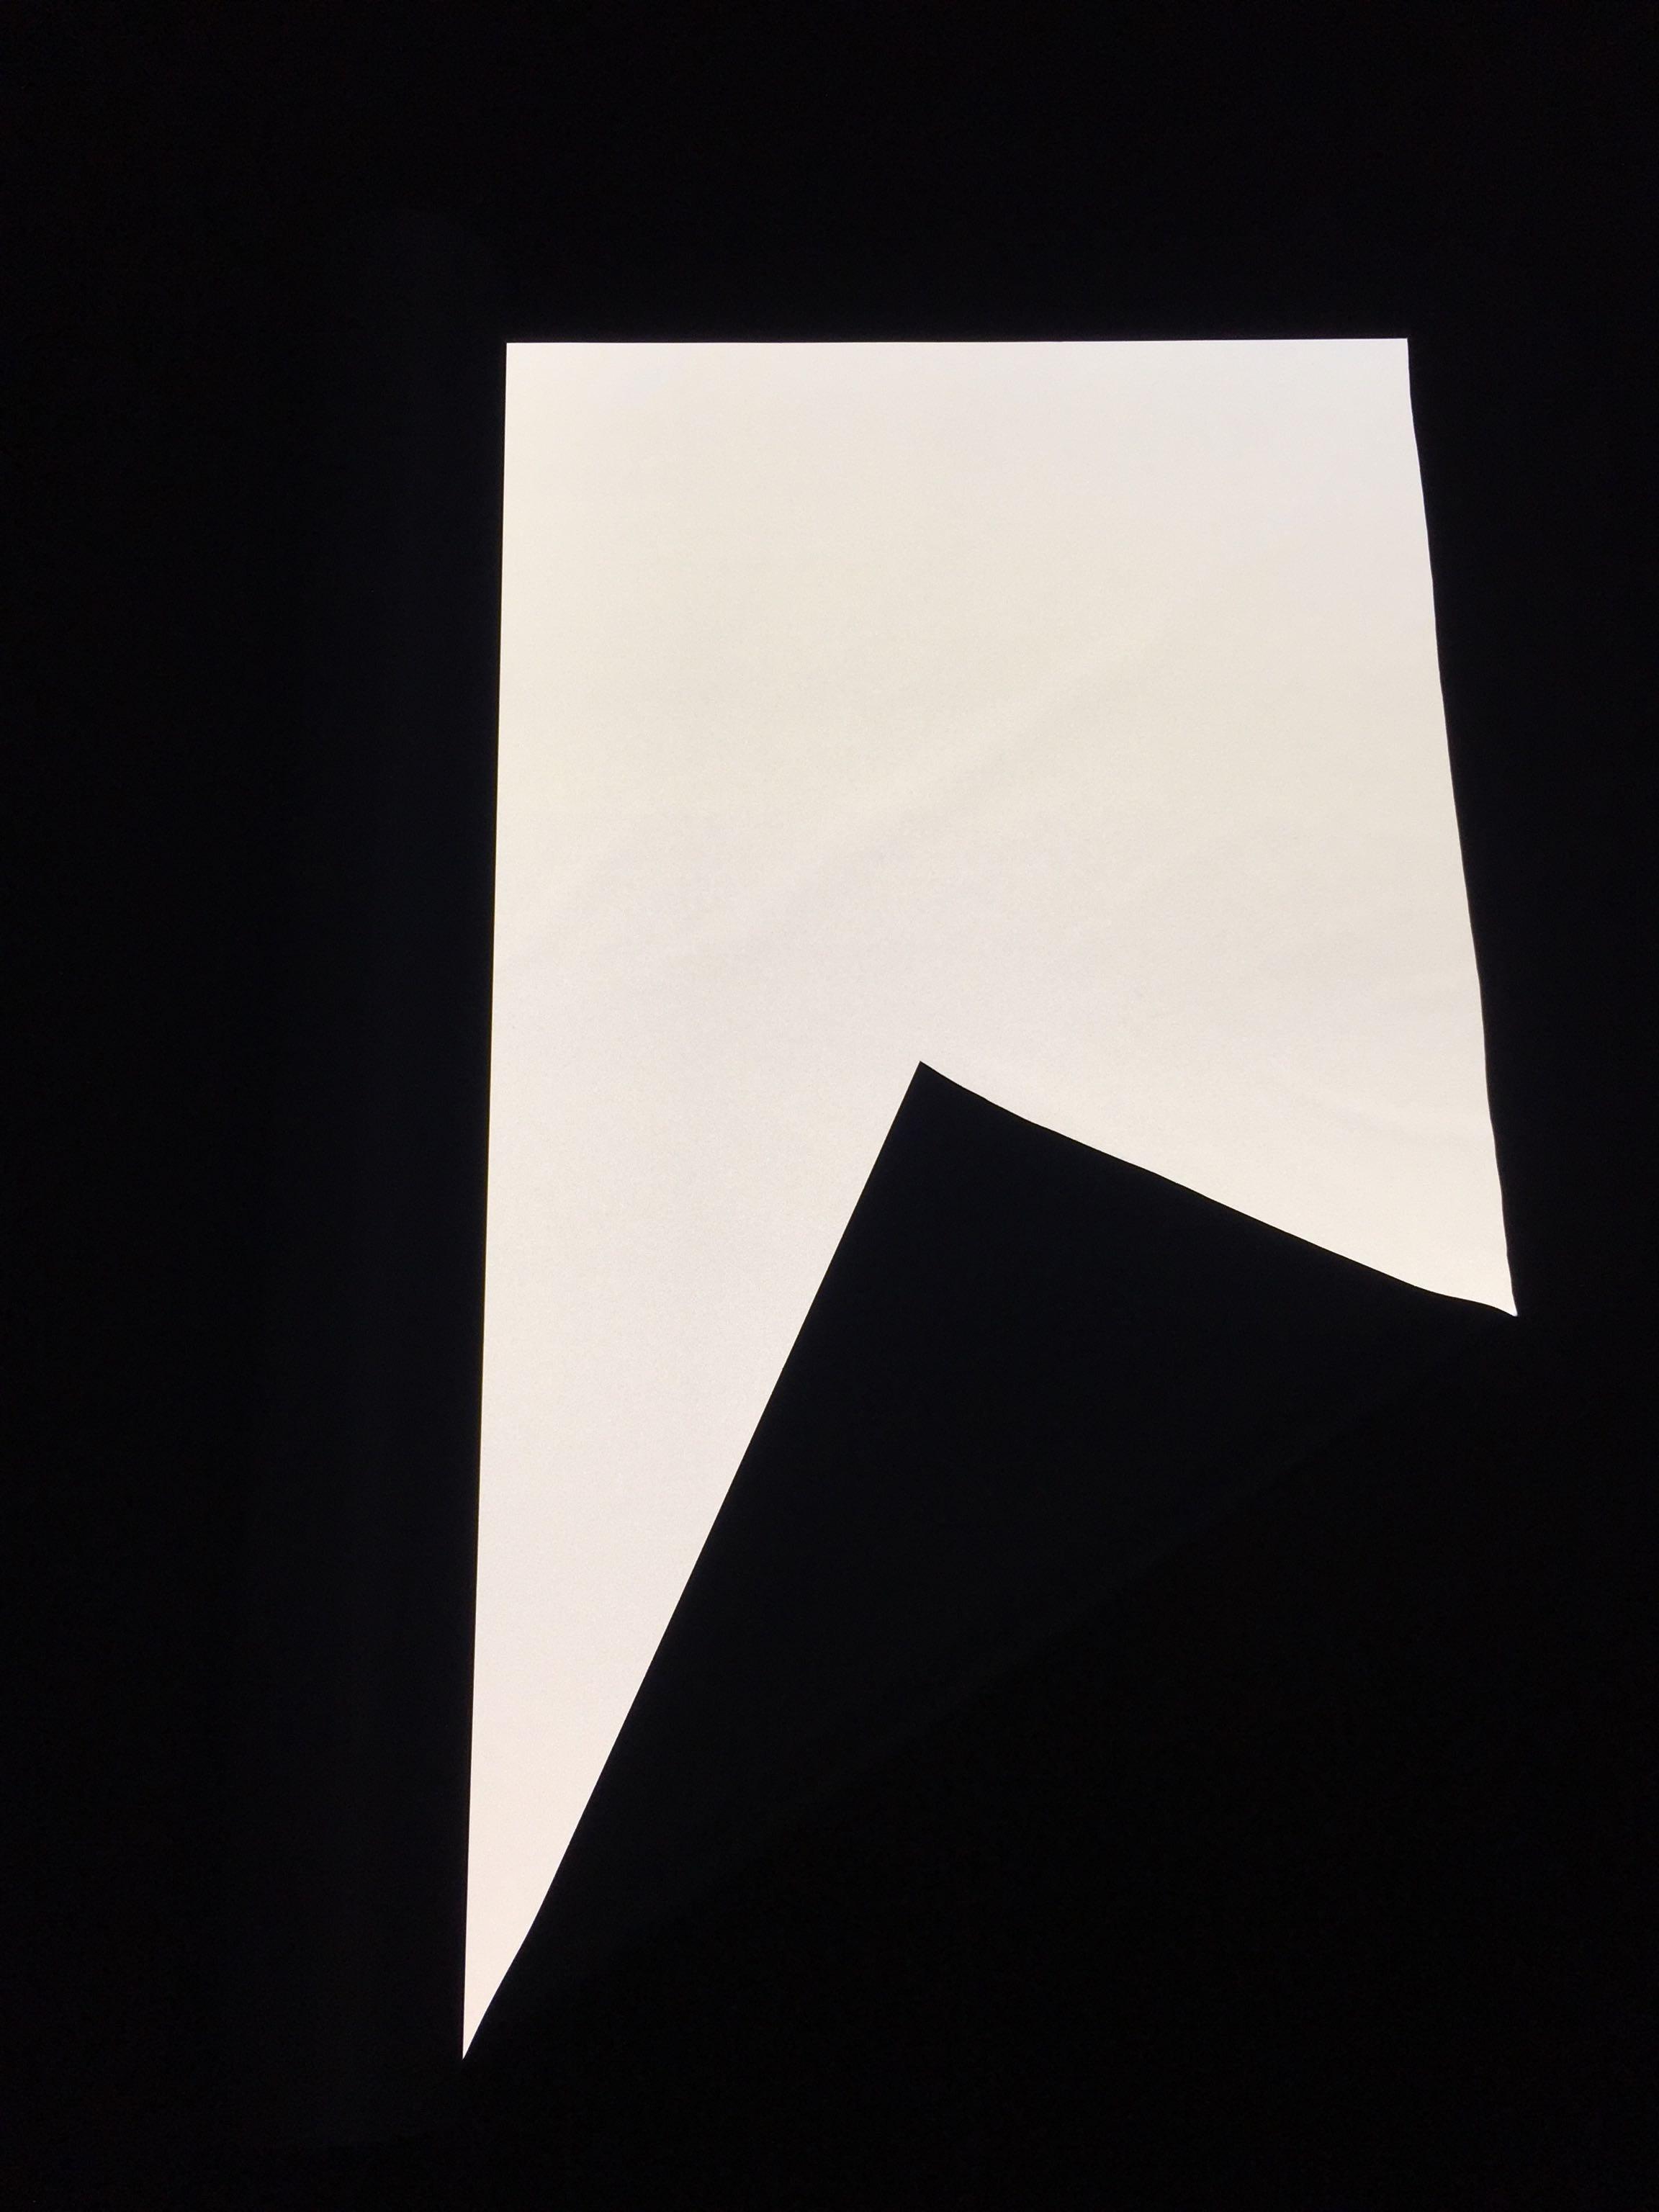 EN471 Level 2 High Visibility Reflective Fabric Warning Reflective Tape Sewing For Garment Vest Bag